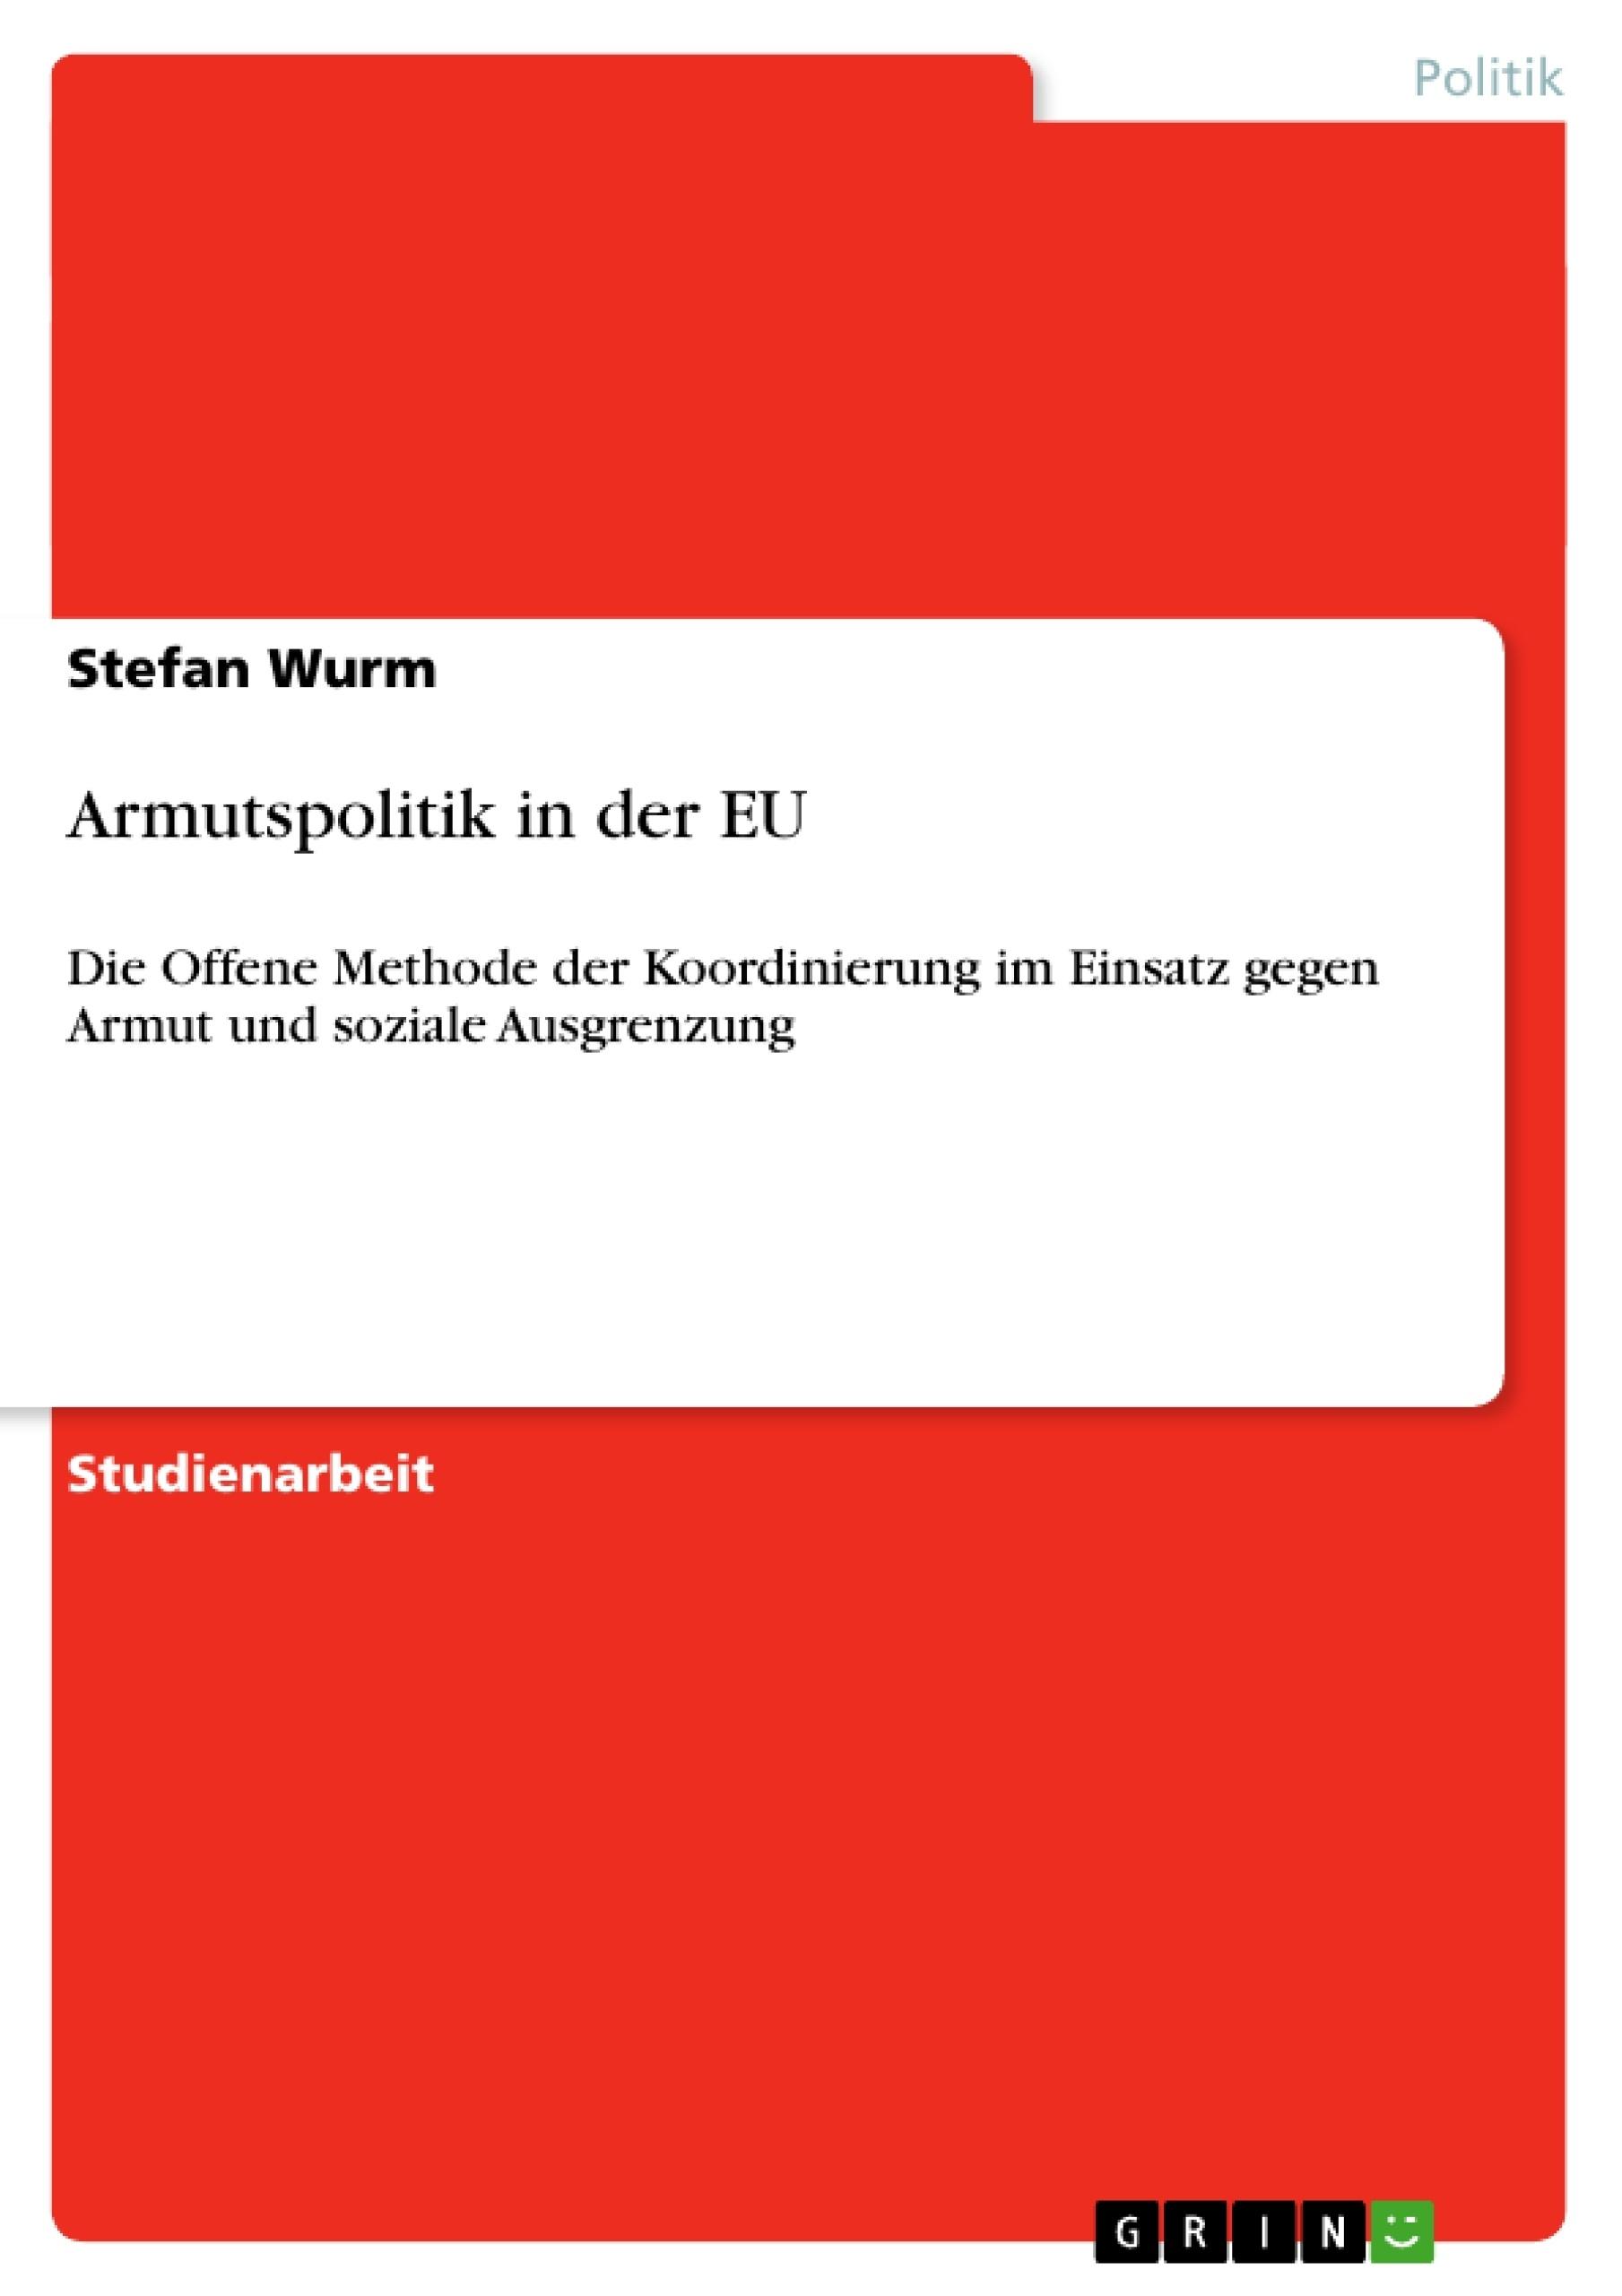 Titel: Armutspolitik in der EU